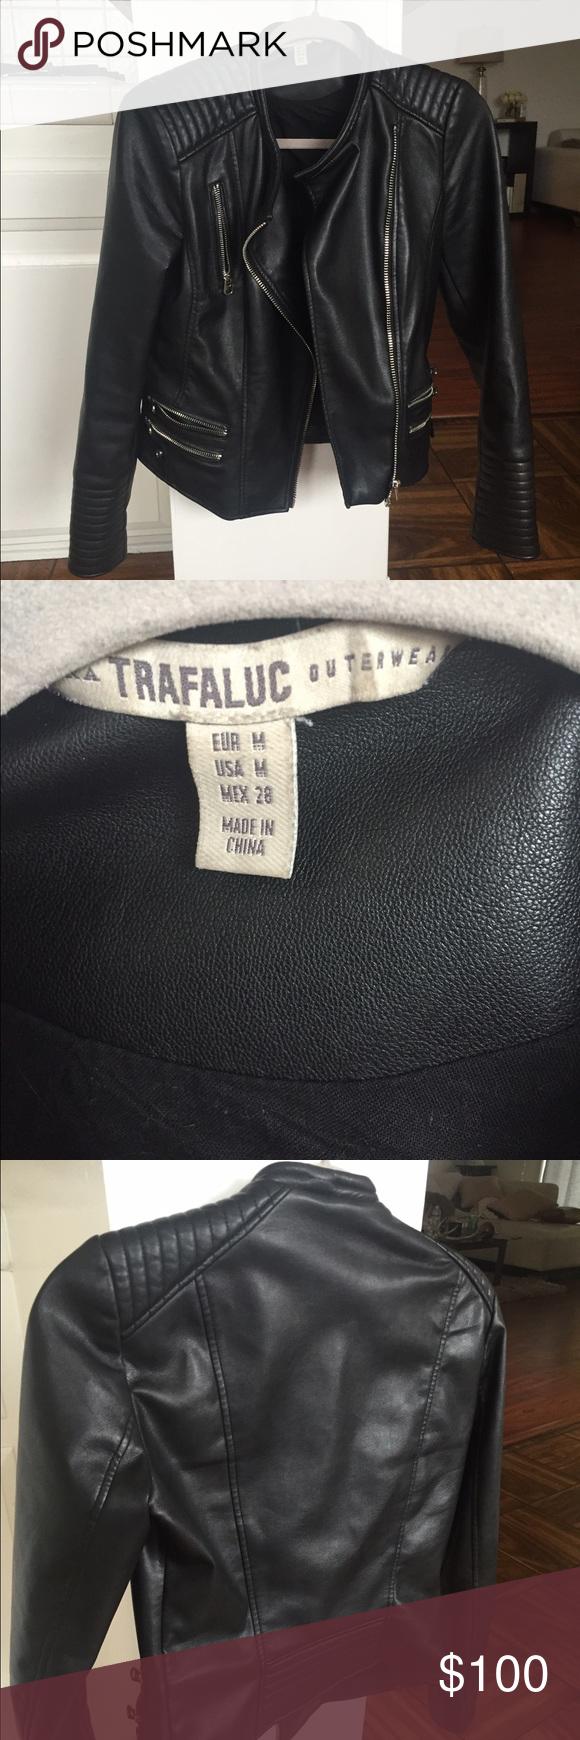 Zara Trafaluc Outerwear Jacket Size Medium Zara Outerwear Jackets Jackets [ 1740 x 580 Pixel ]